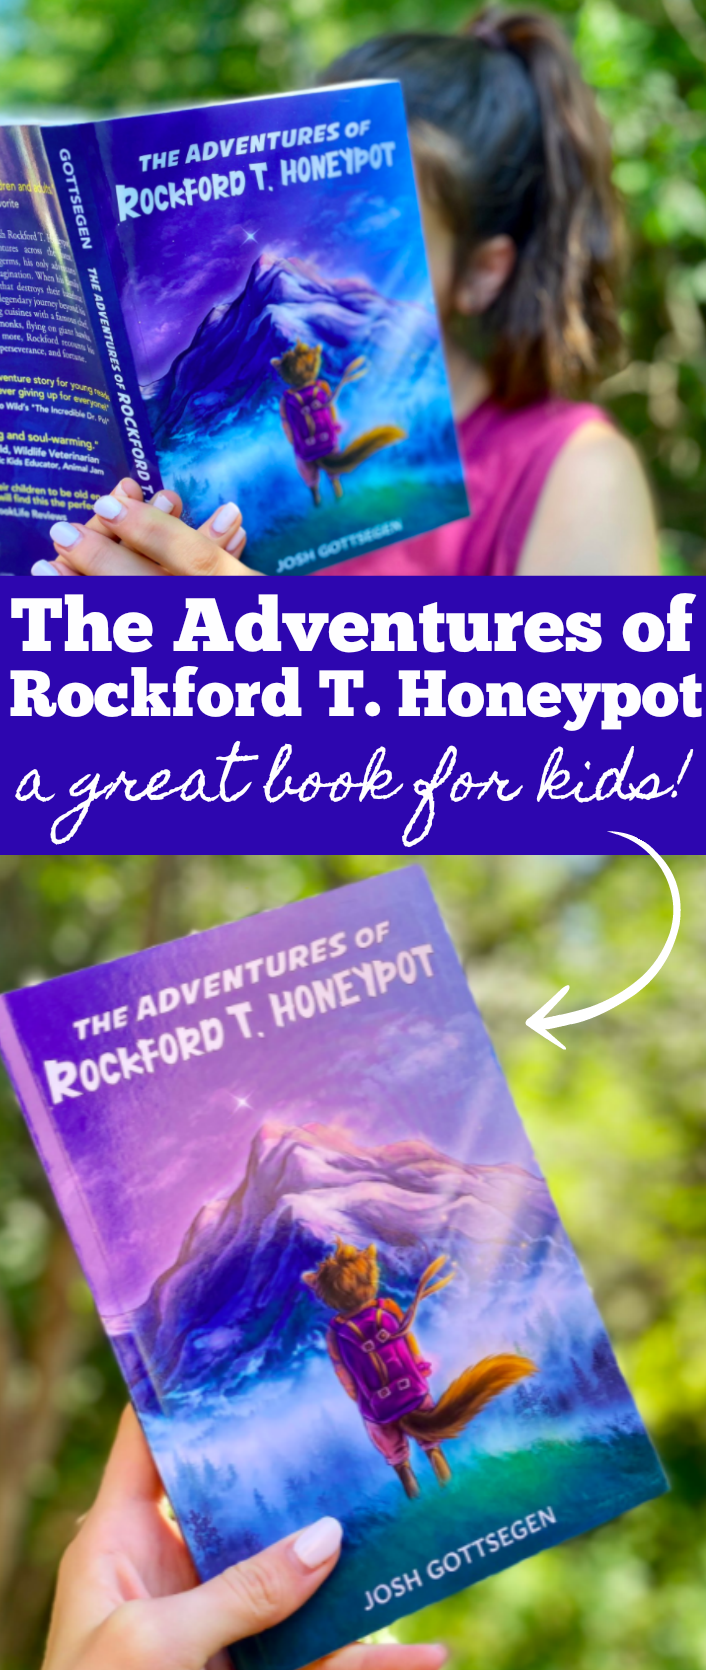 Josh Gottsegen Adventures of Rockford T Honeypot